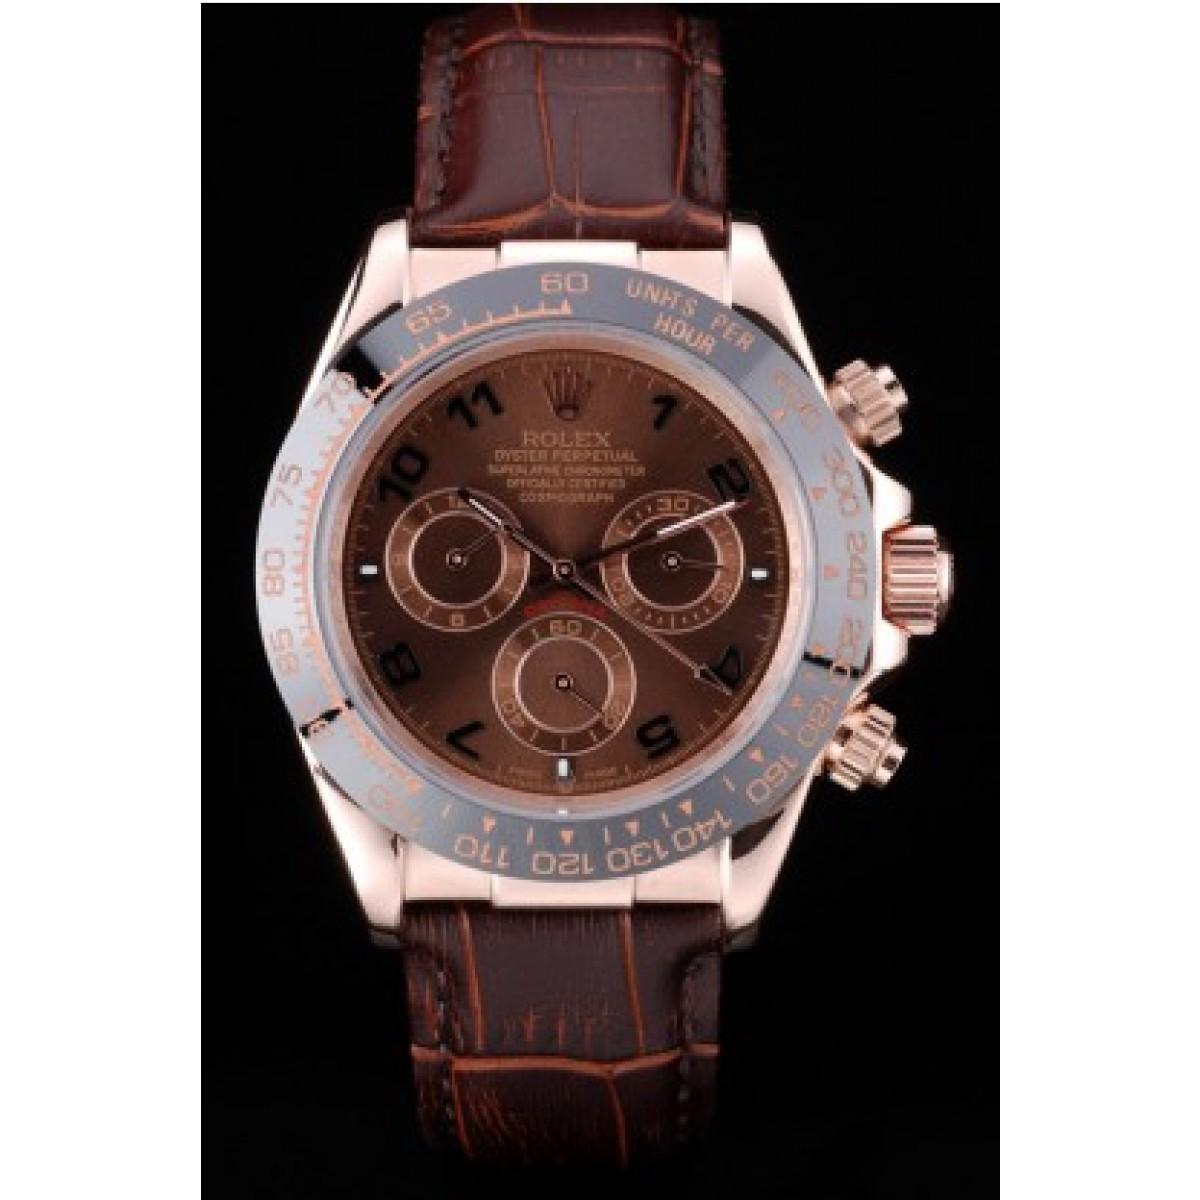 ab0198fcb64 Réplica Relógio Rolex Daytona Chocolate ...